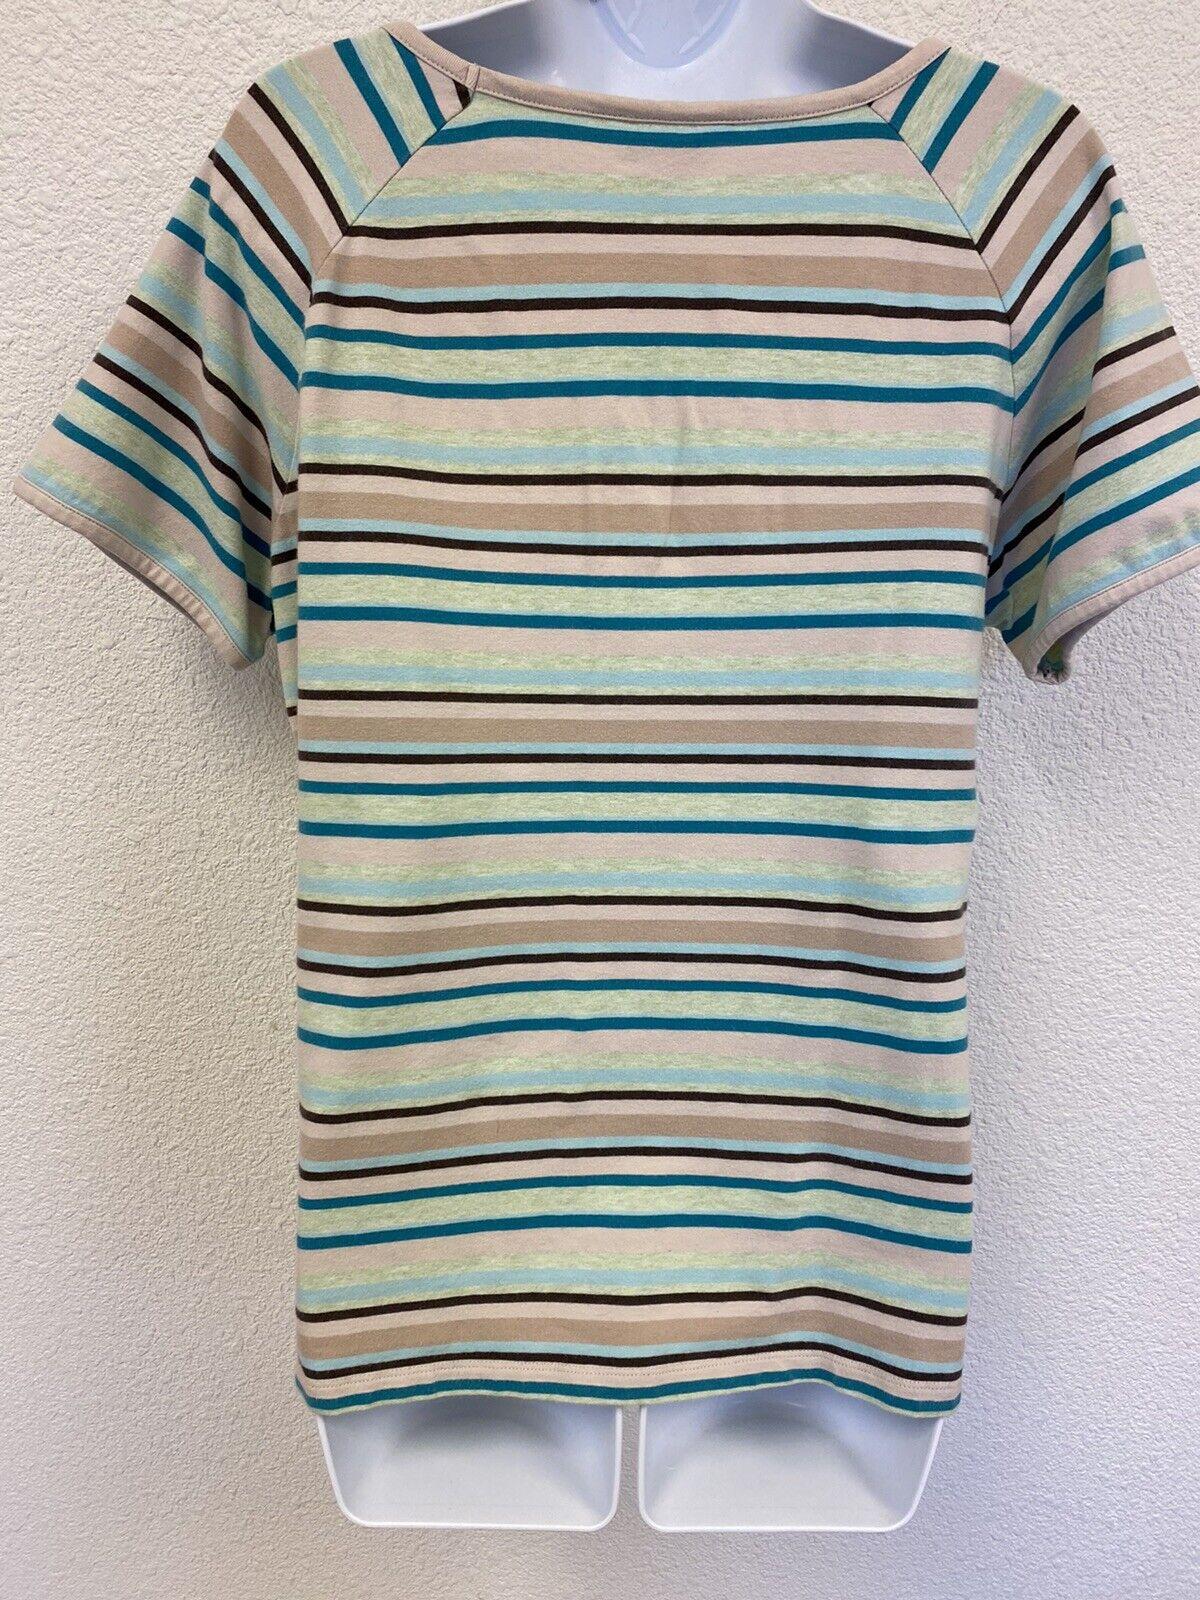 Christopher & Banks Women's Large Striped Short S… - image 4